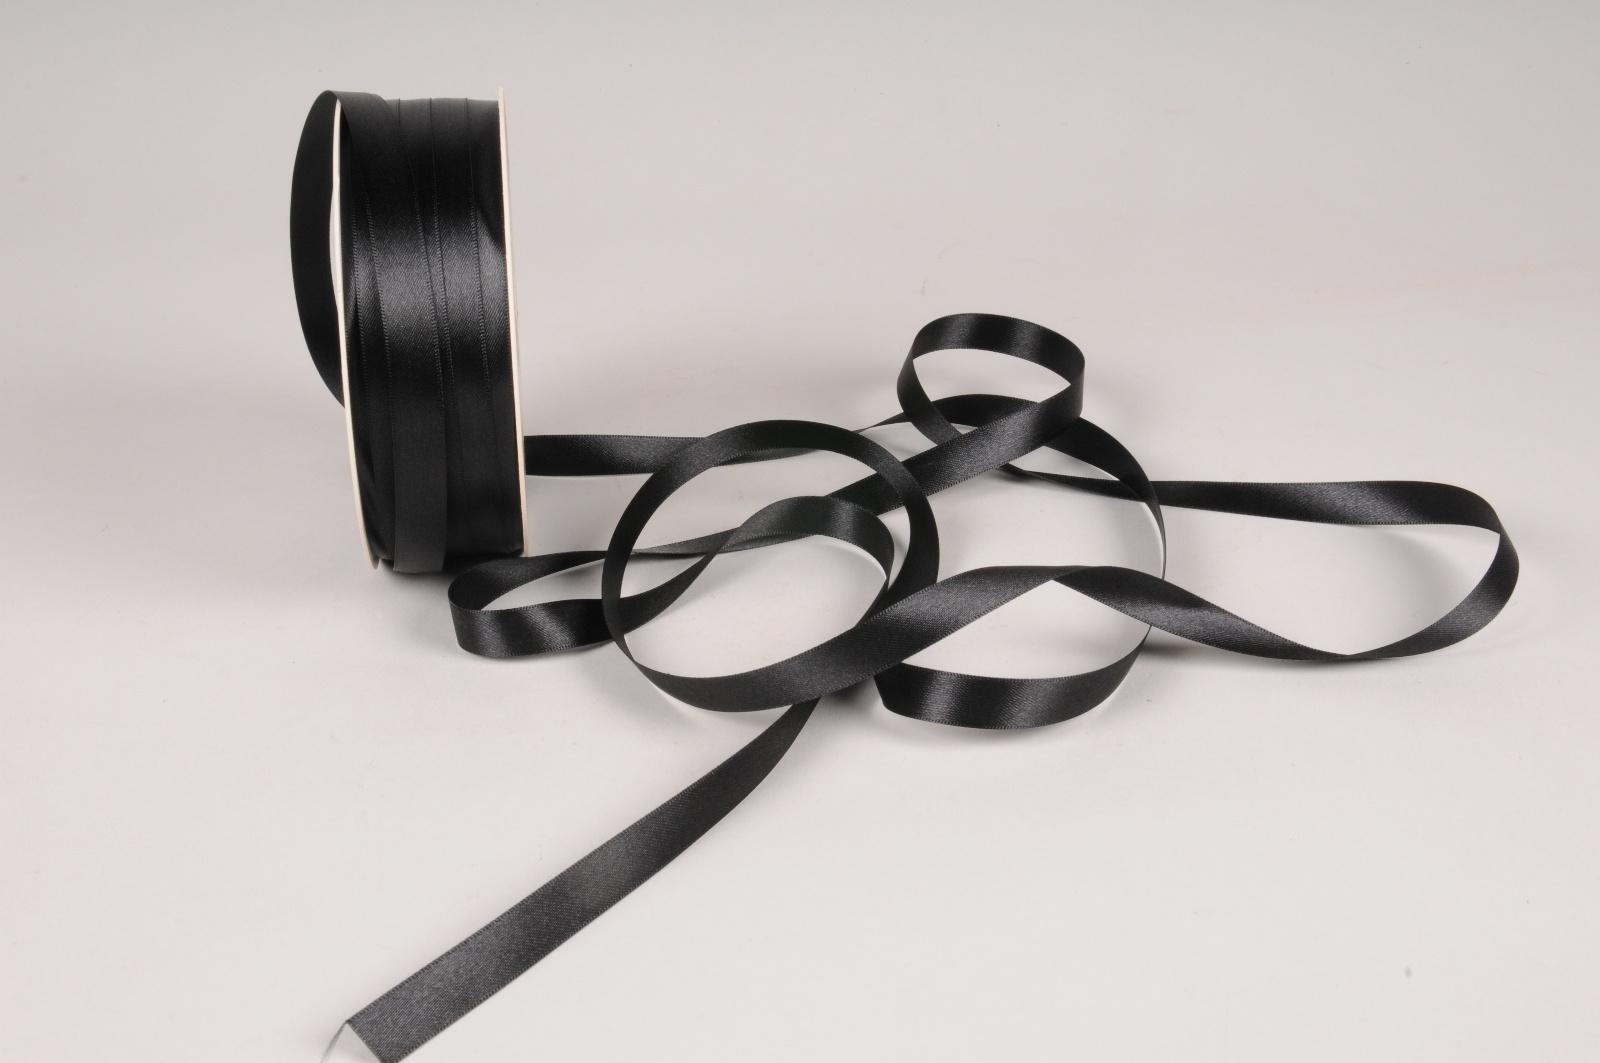 A075UN Ruban satin noir 12mm x 100m